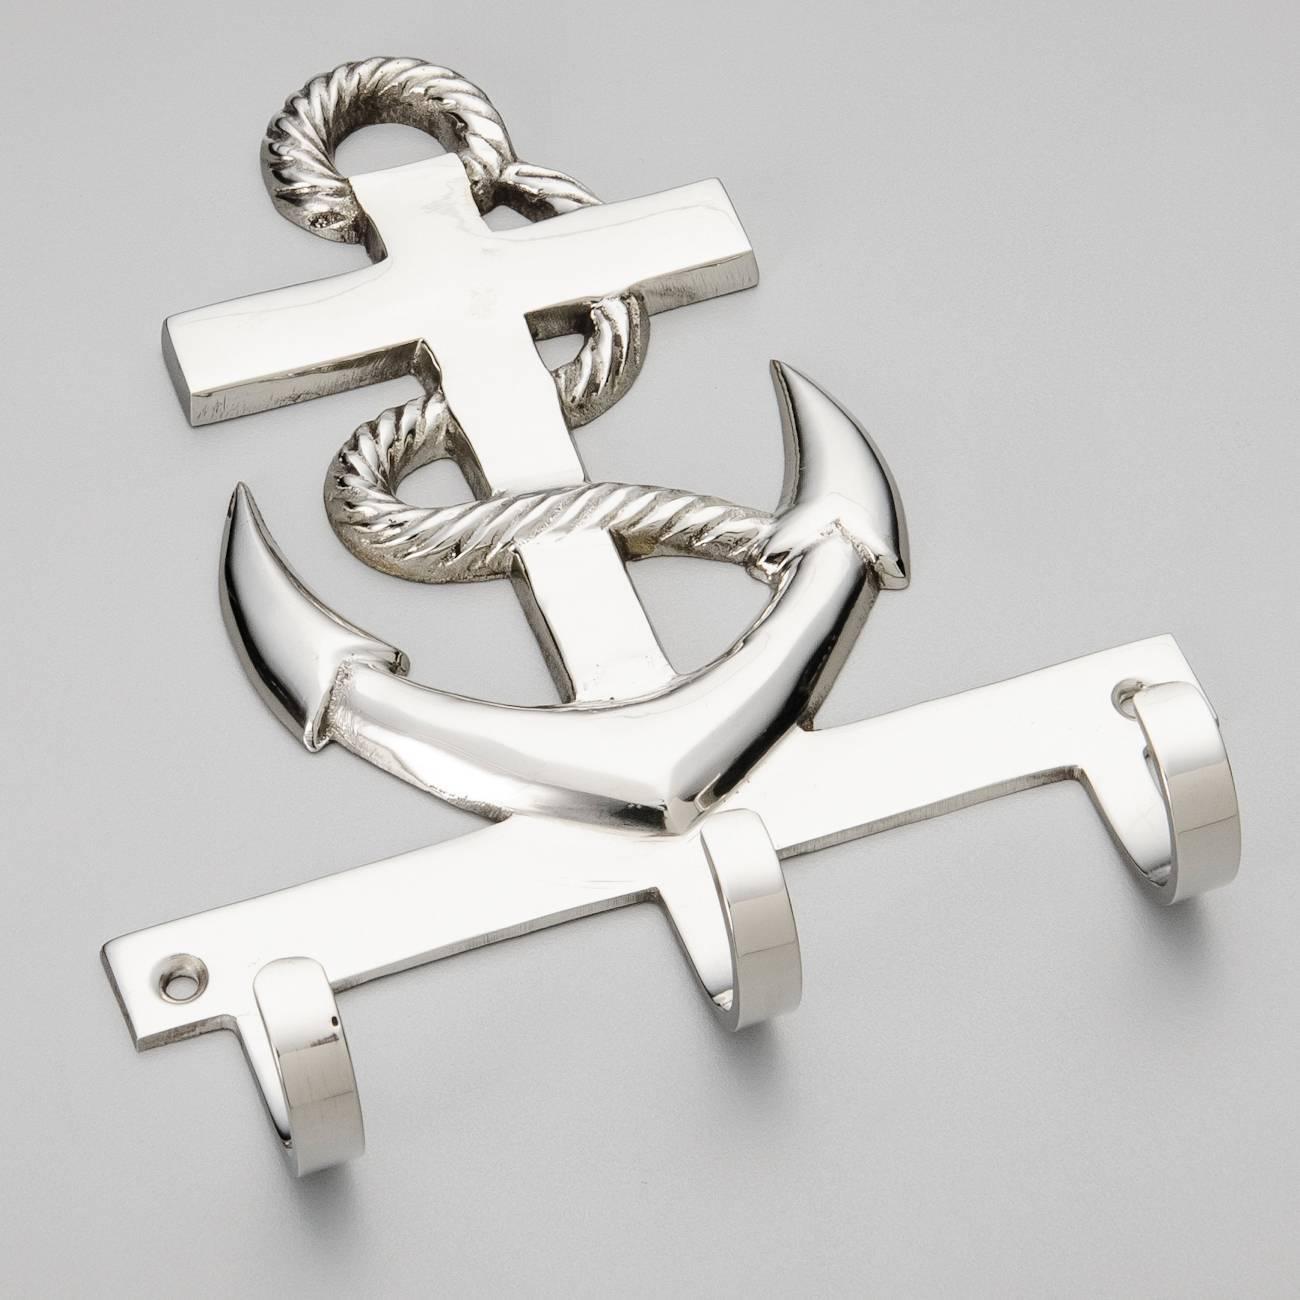 Porta-Chaves Âncora - com 3 Granchos - em Metal - Prestige - 11x10 cm